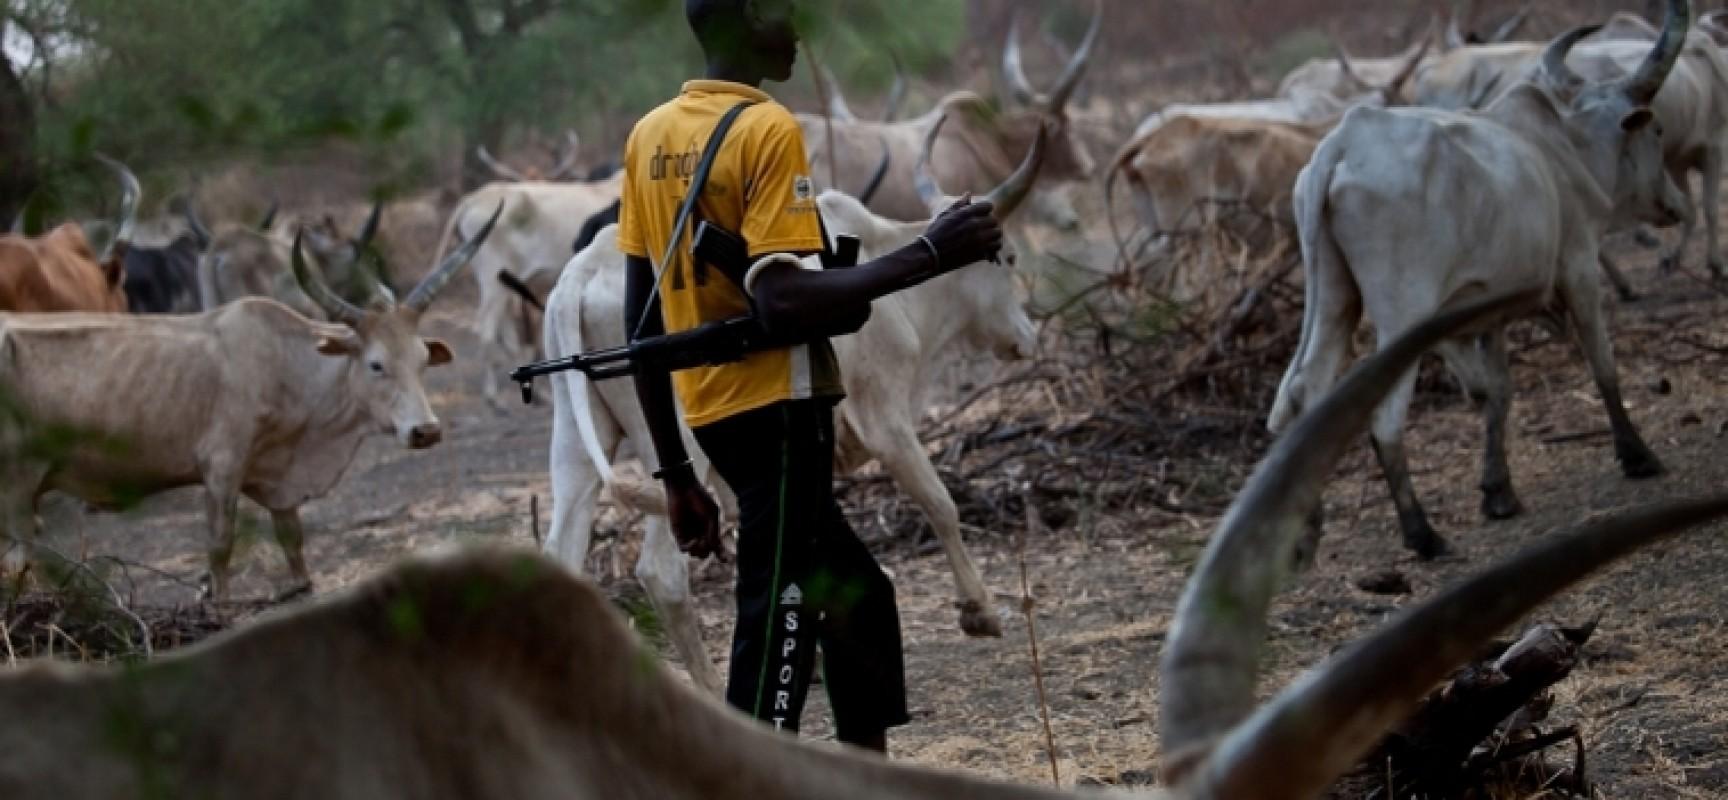 Fulani herdsmen attack Benue community, kill four - BarristerNG.com